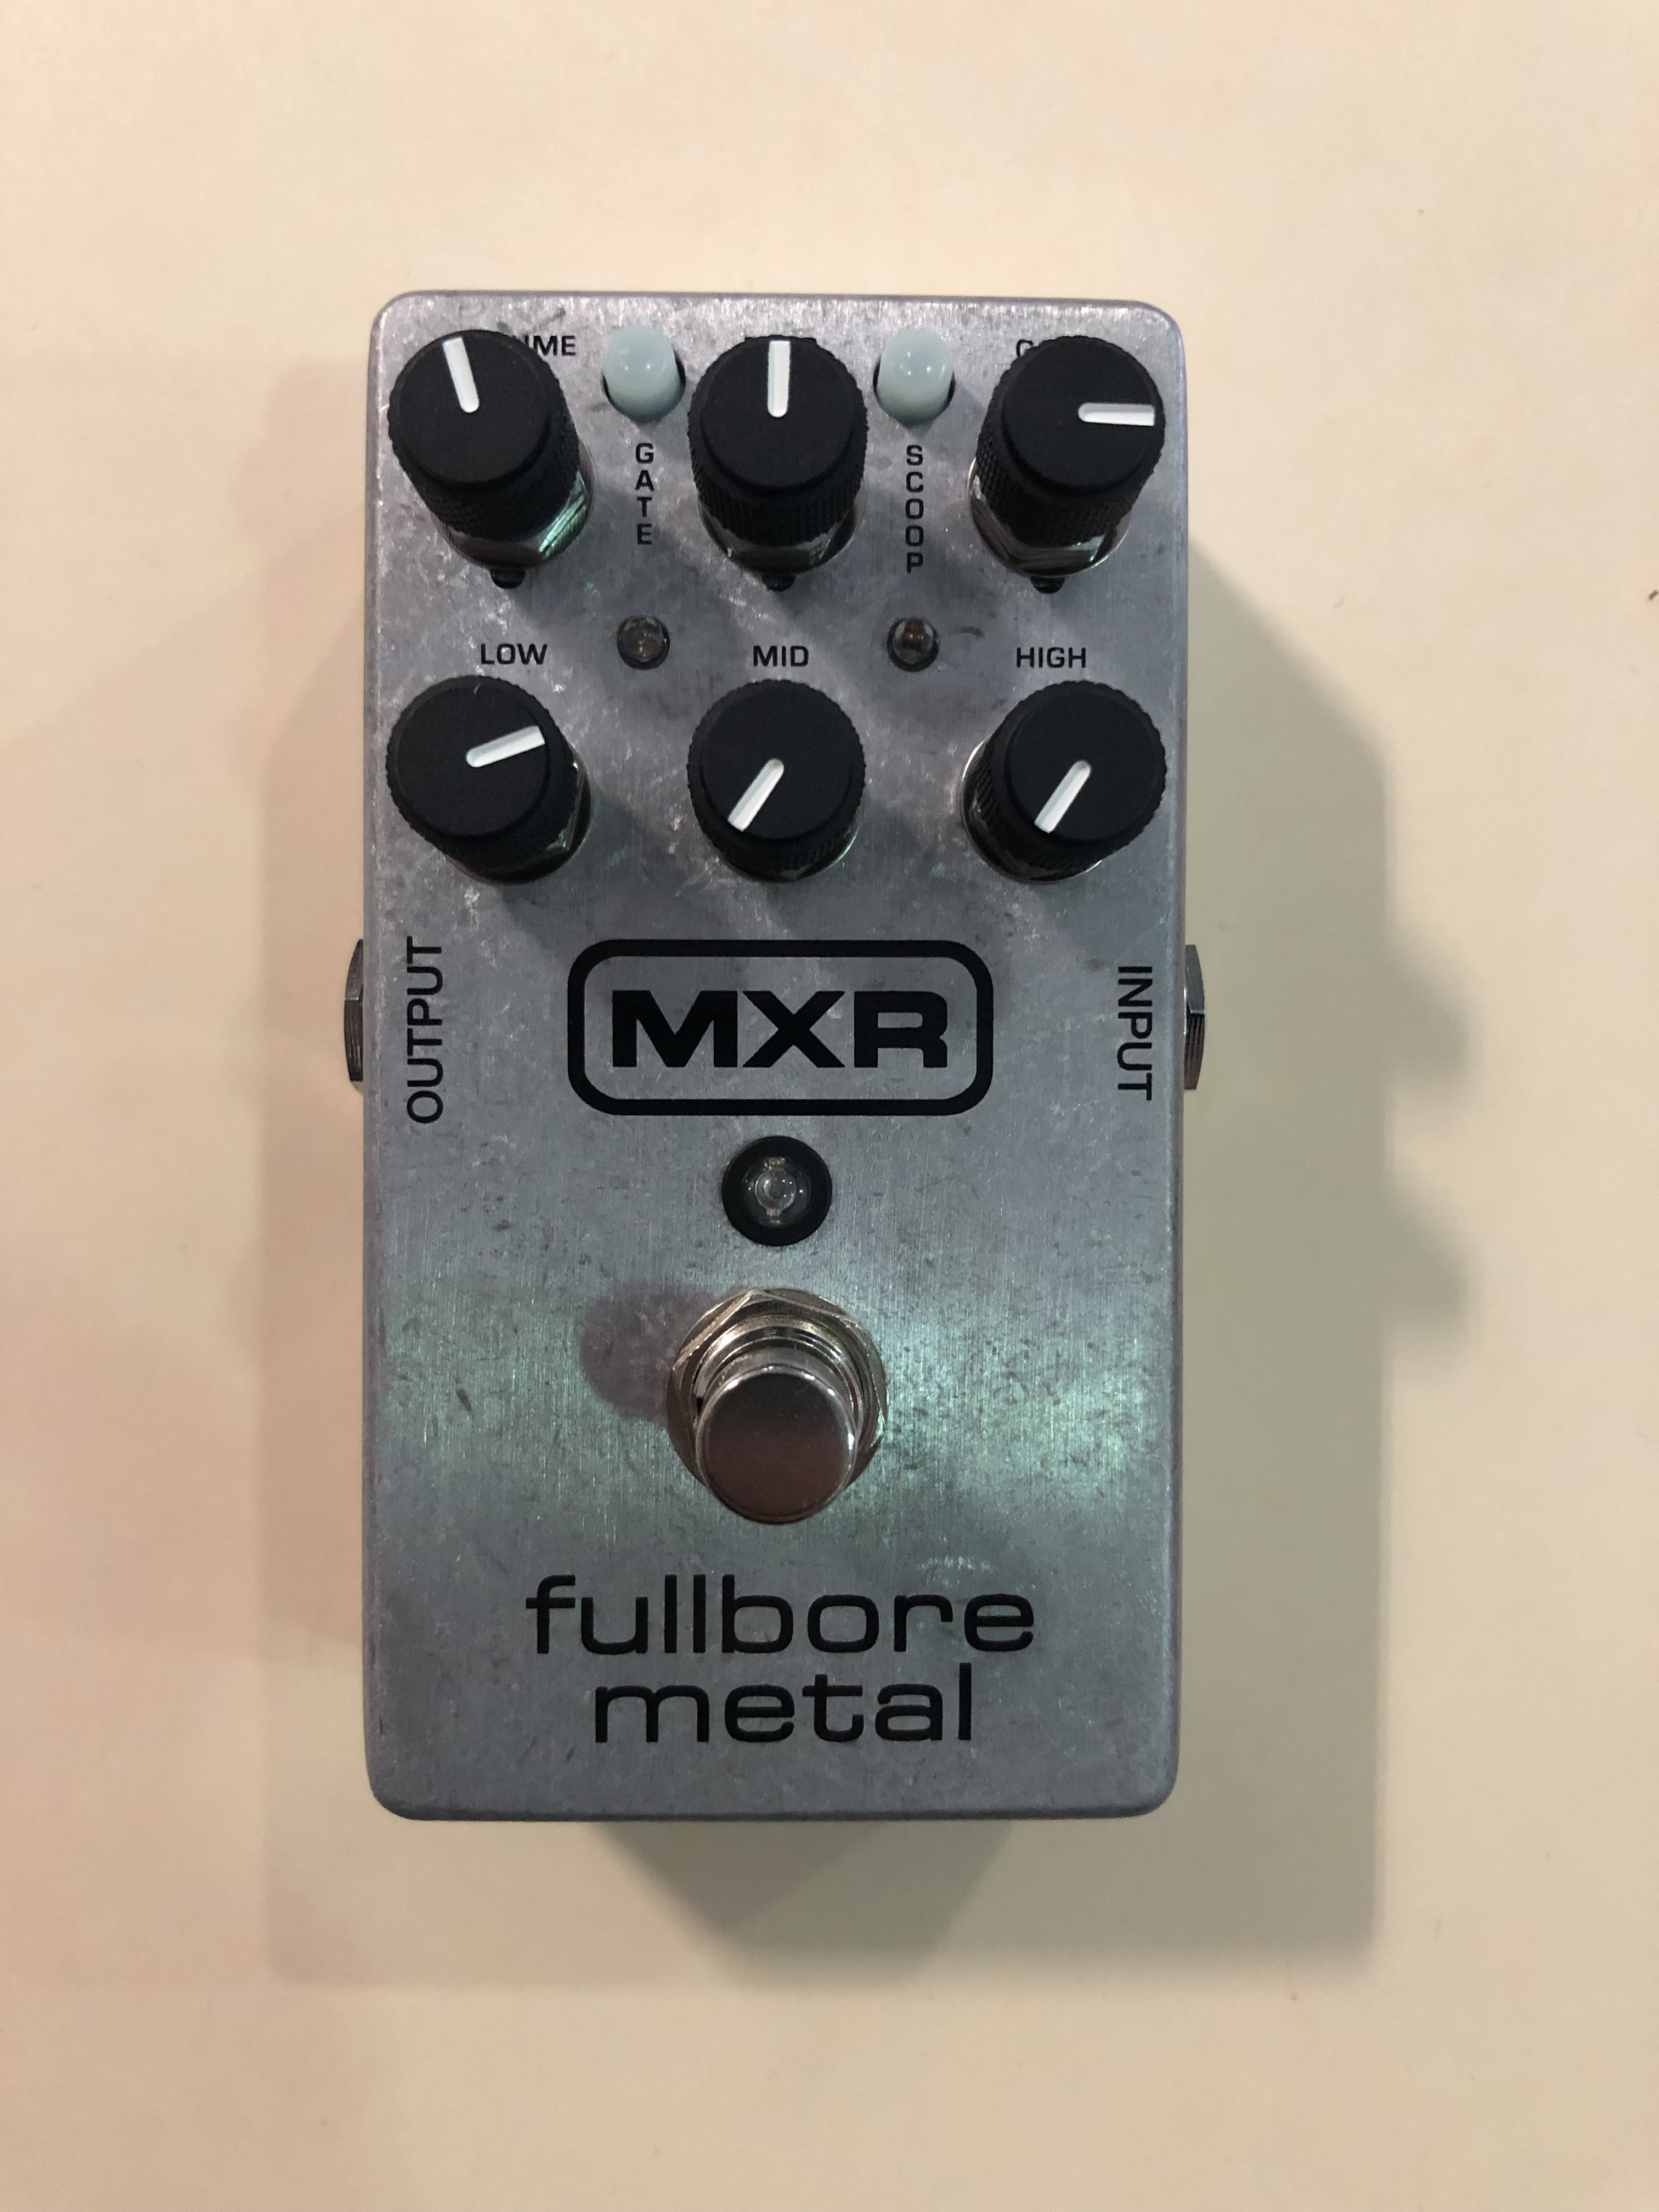 MXR - M116 FULLBORE METAL - DISTORTION EFFECTS PEDAL